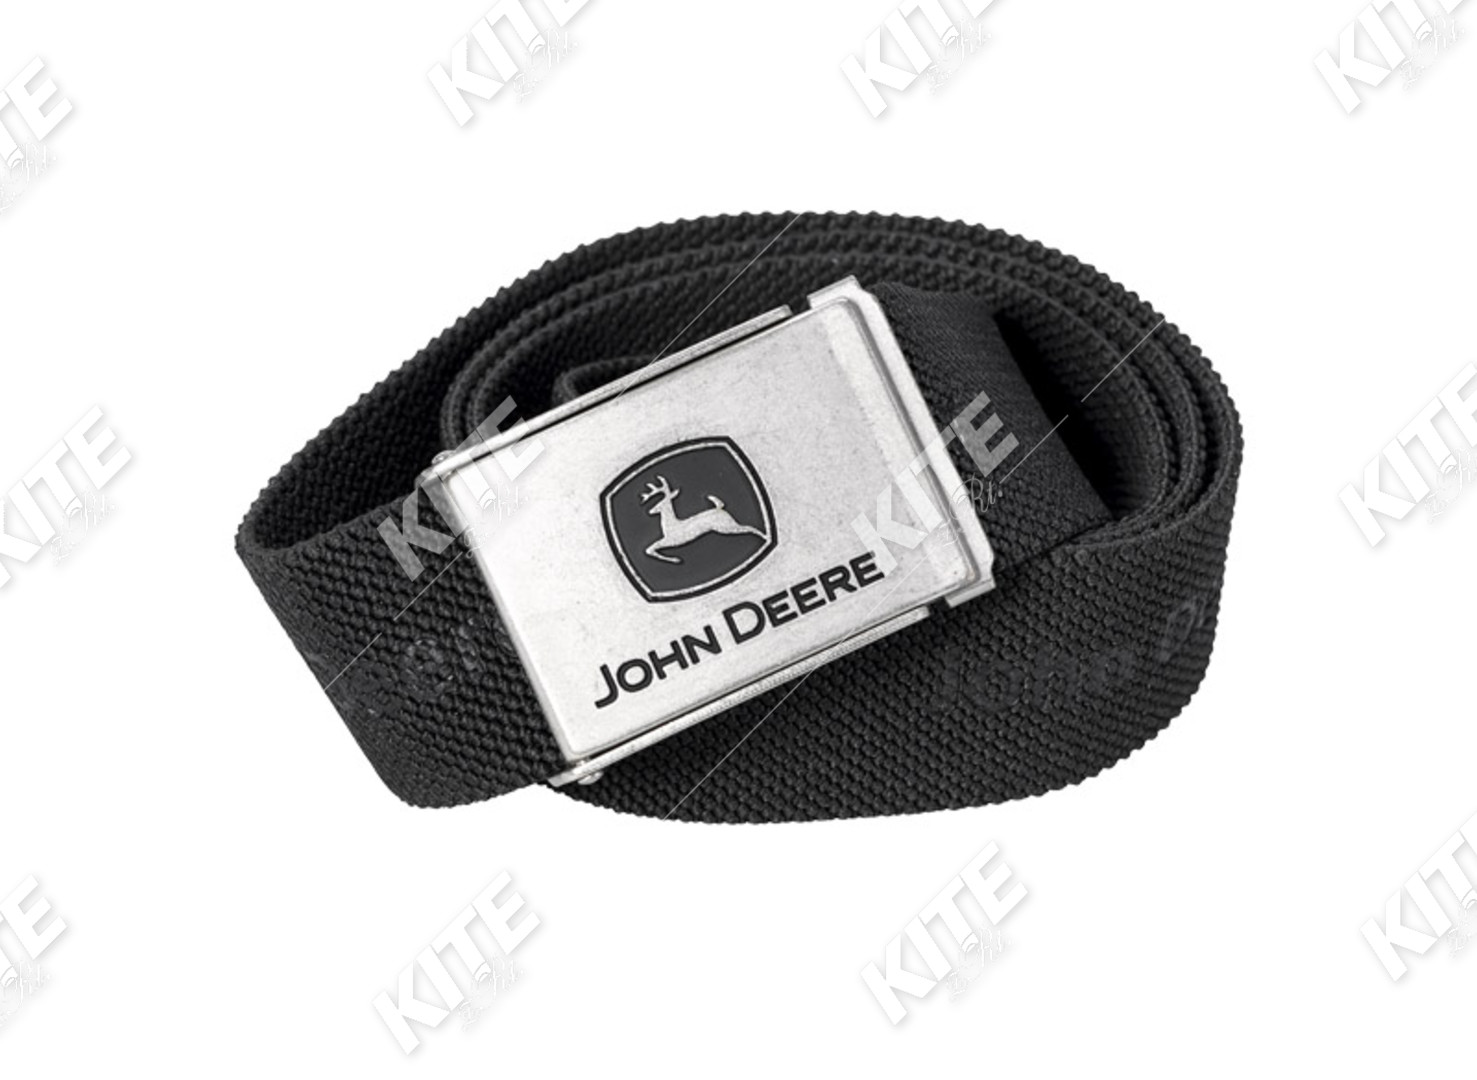 John Deere férfi öv